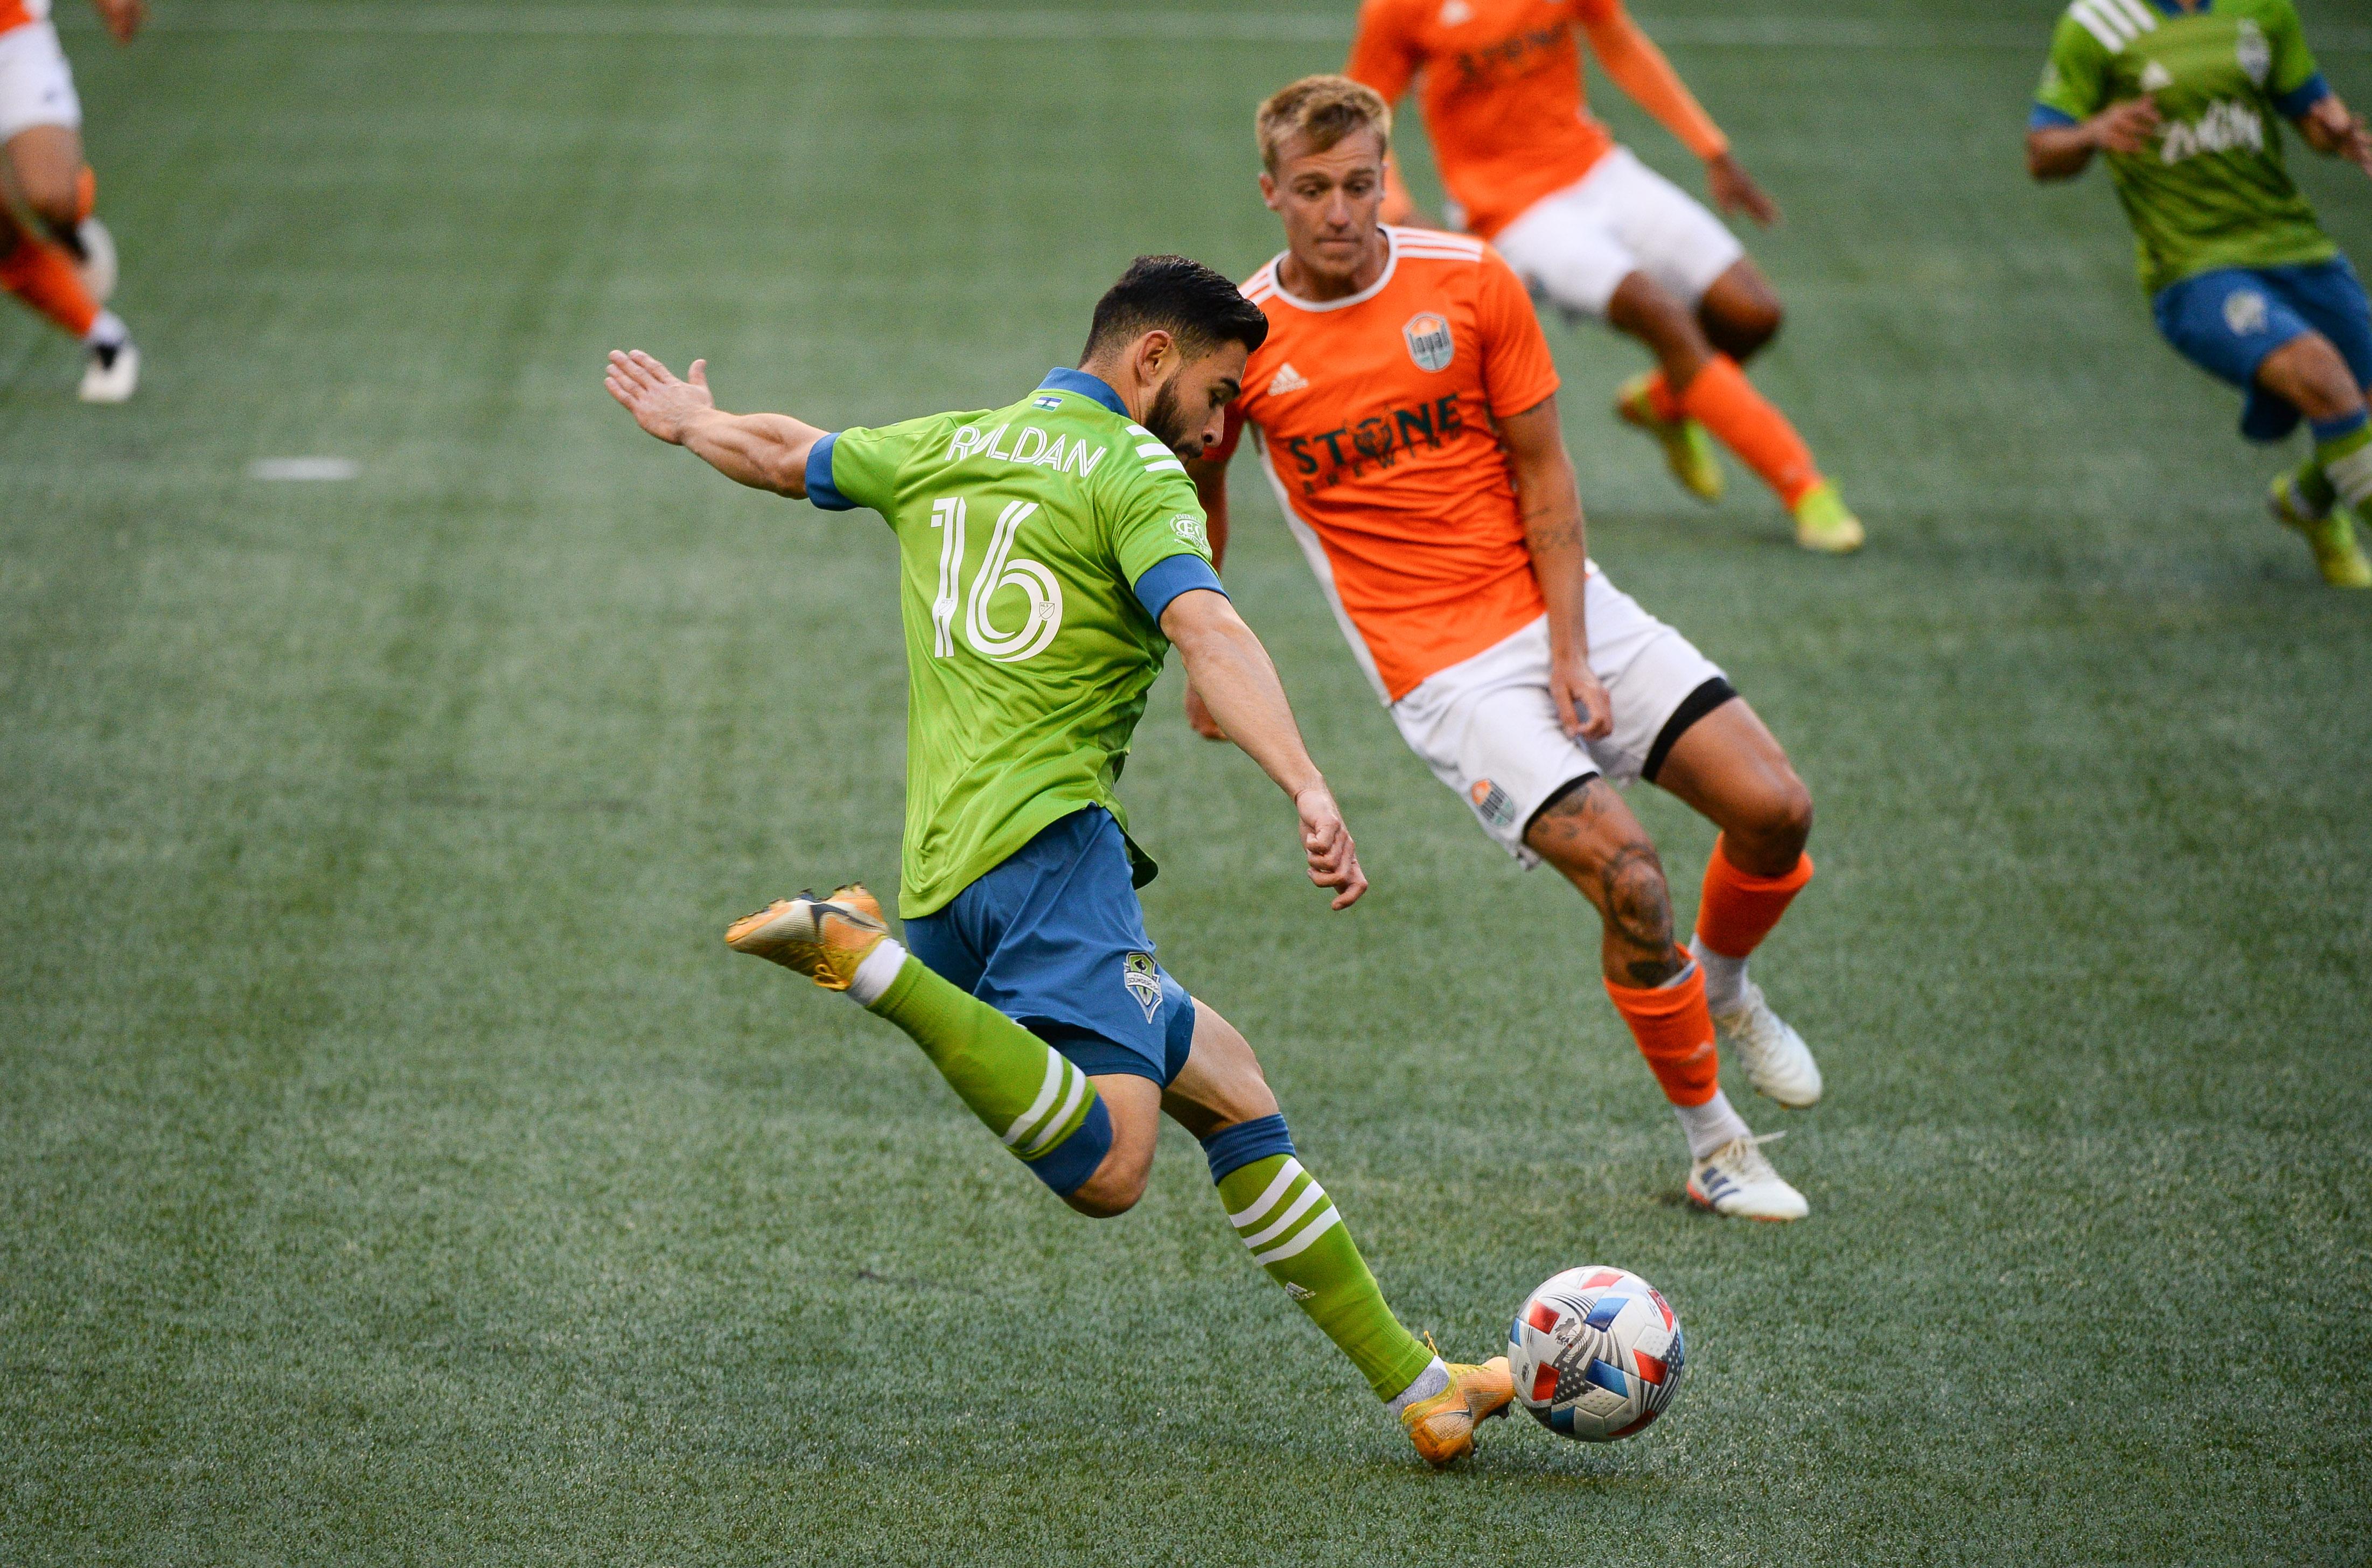 SOCCER: APR 10 MLS - San Diego Loyal SC at Seattle Sounders FC